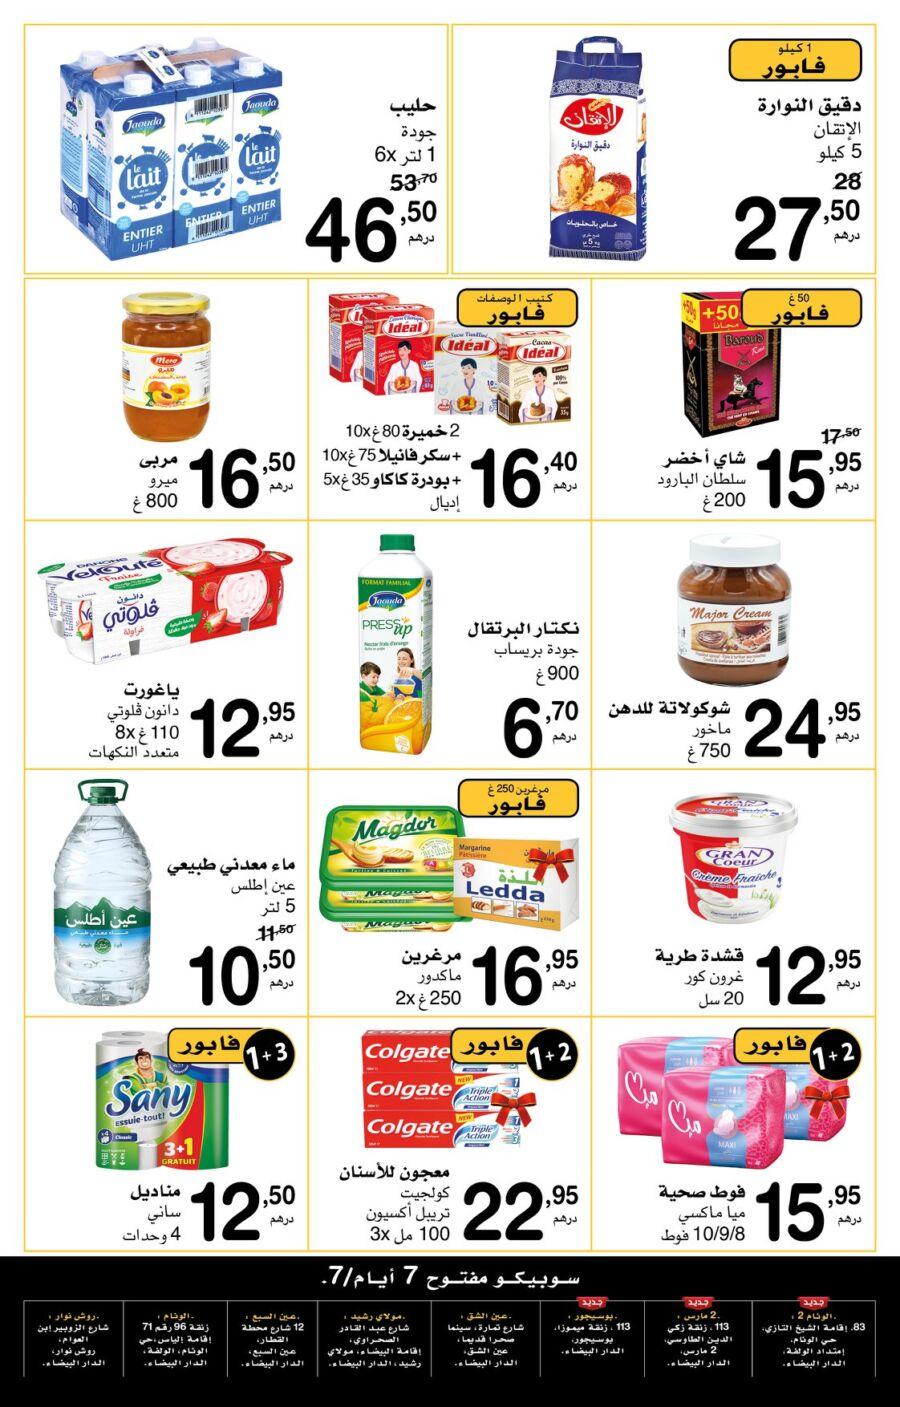 Catalogue Supeco Maroc أثمنة ديما رخيصة du 16 au 27 Avril 2021